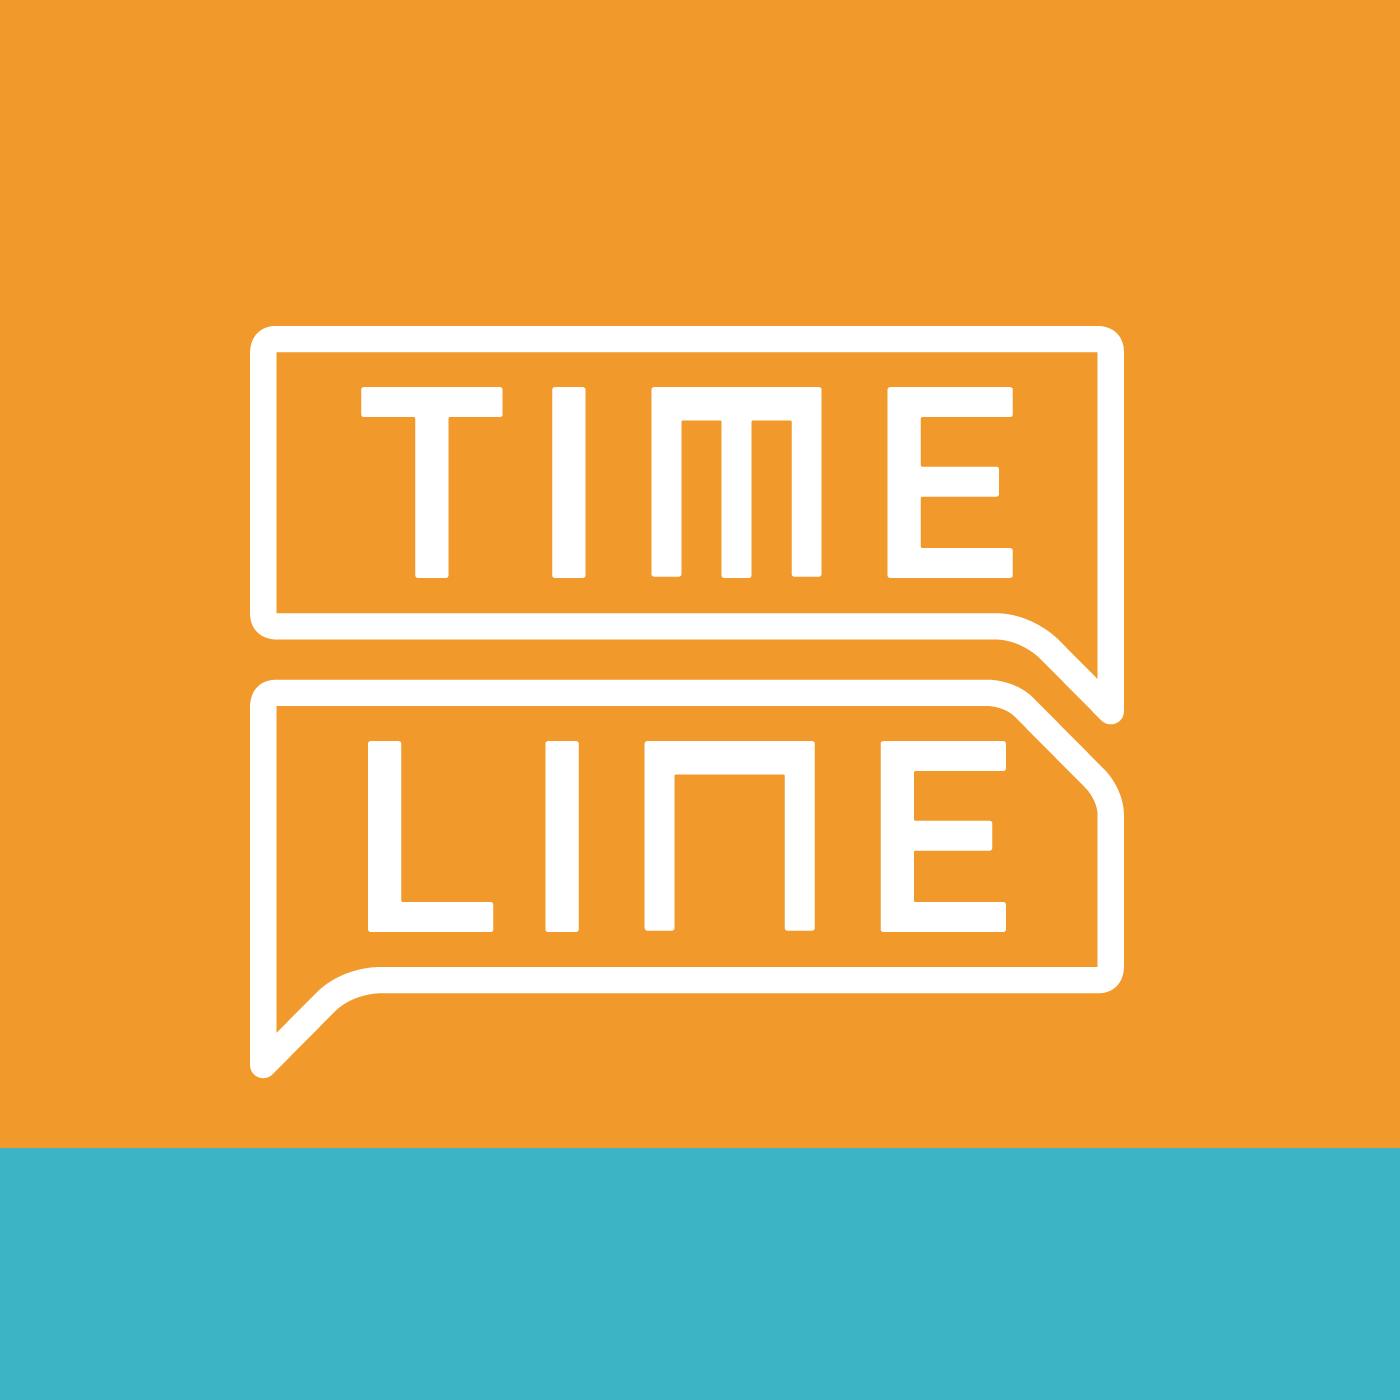 Timeline Gaúcha 05/07/2017